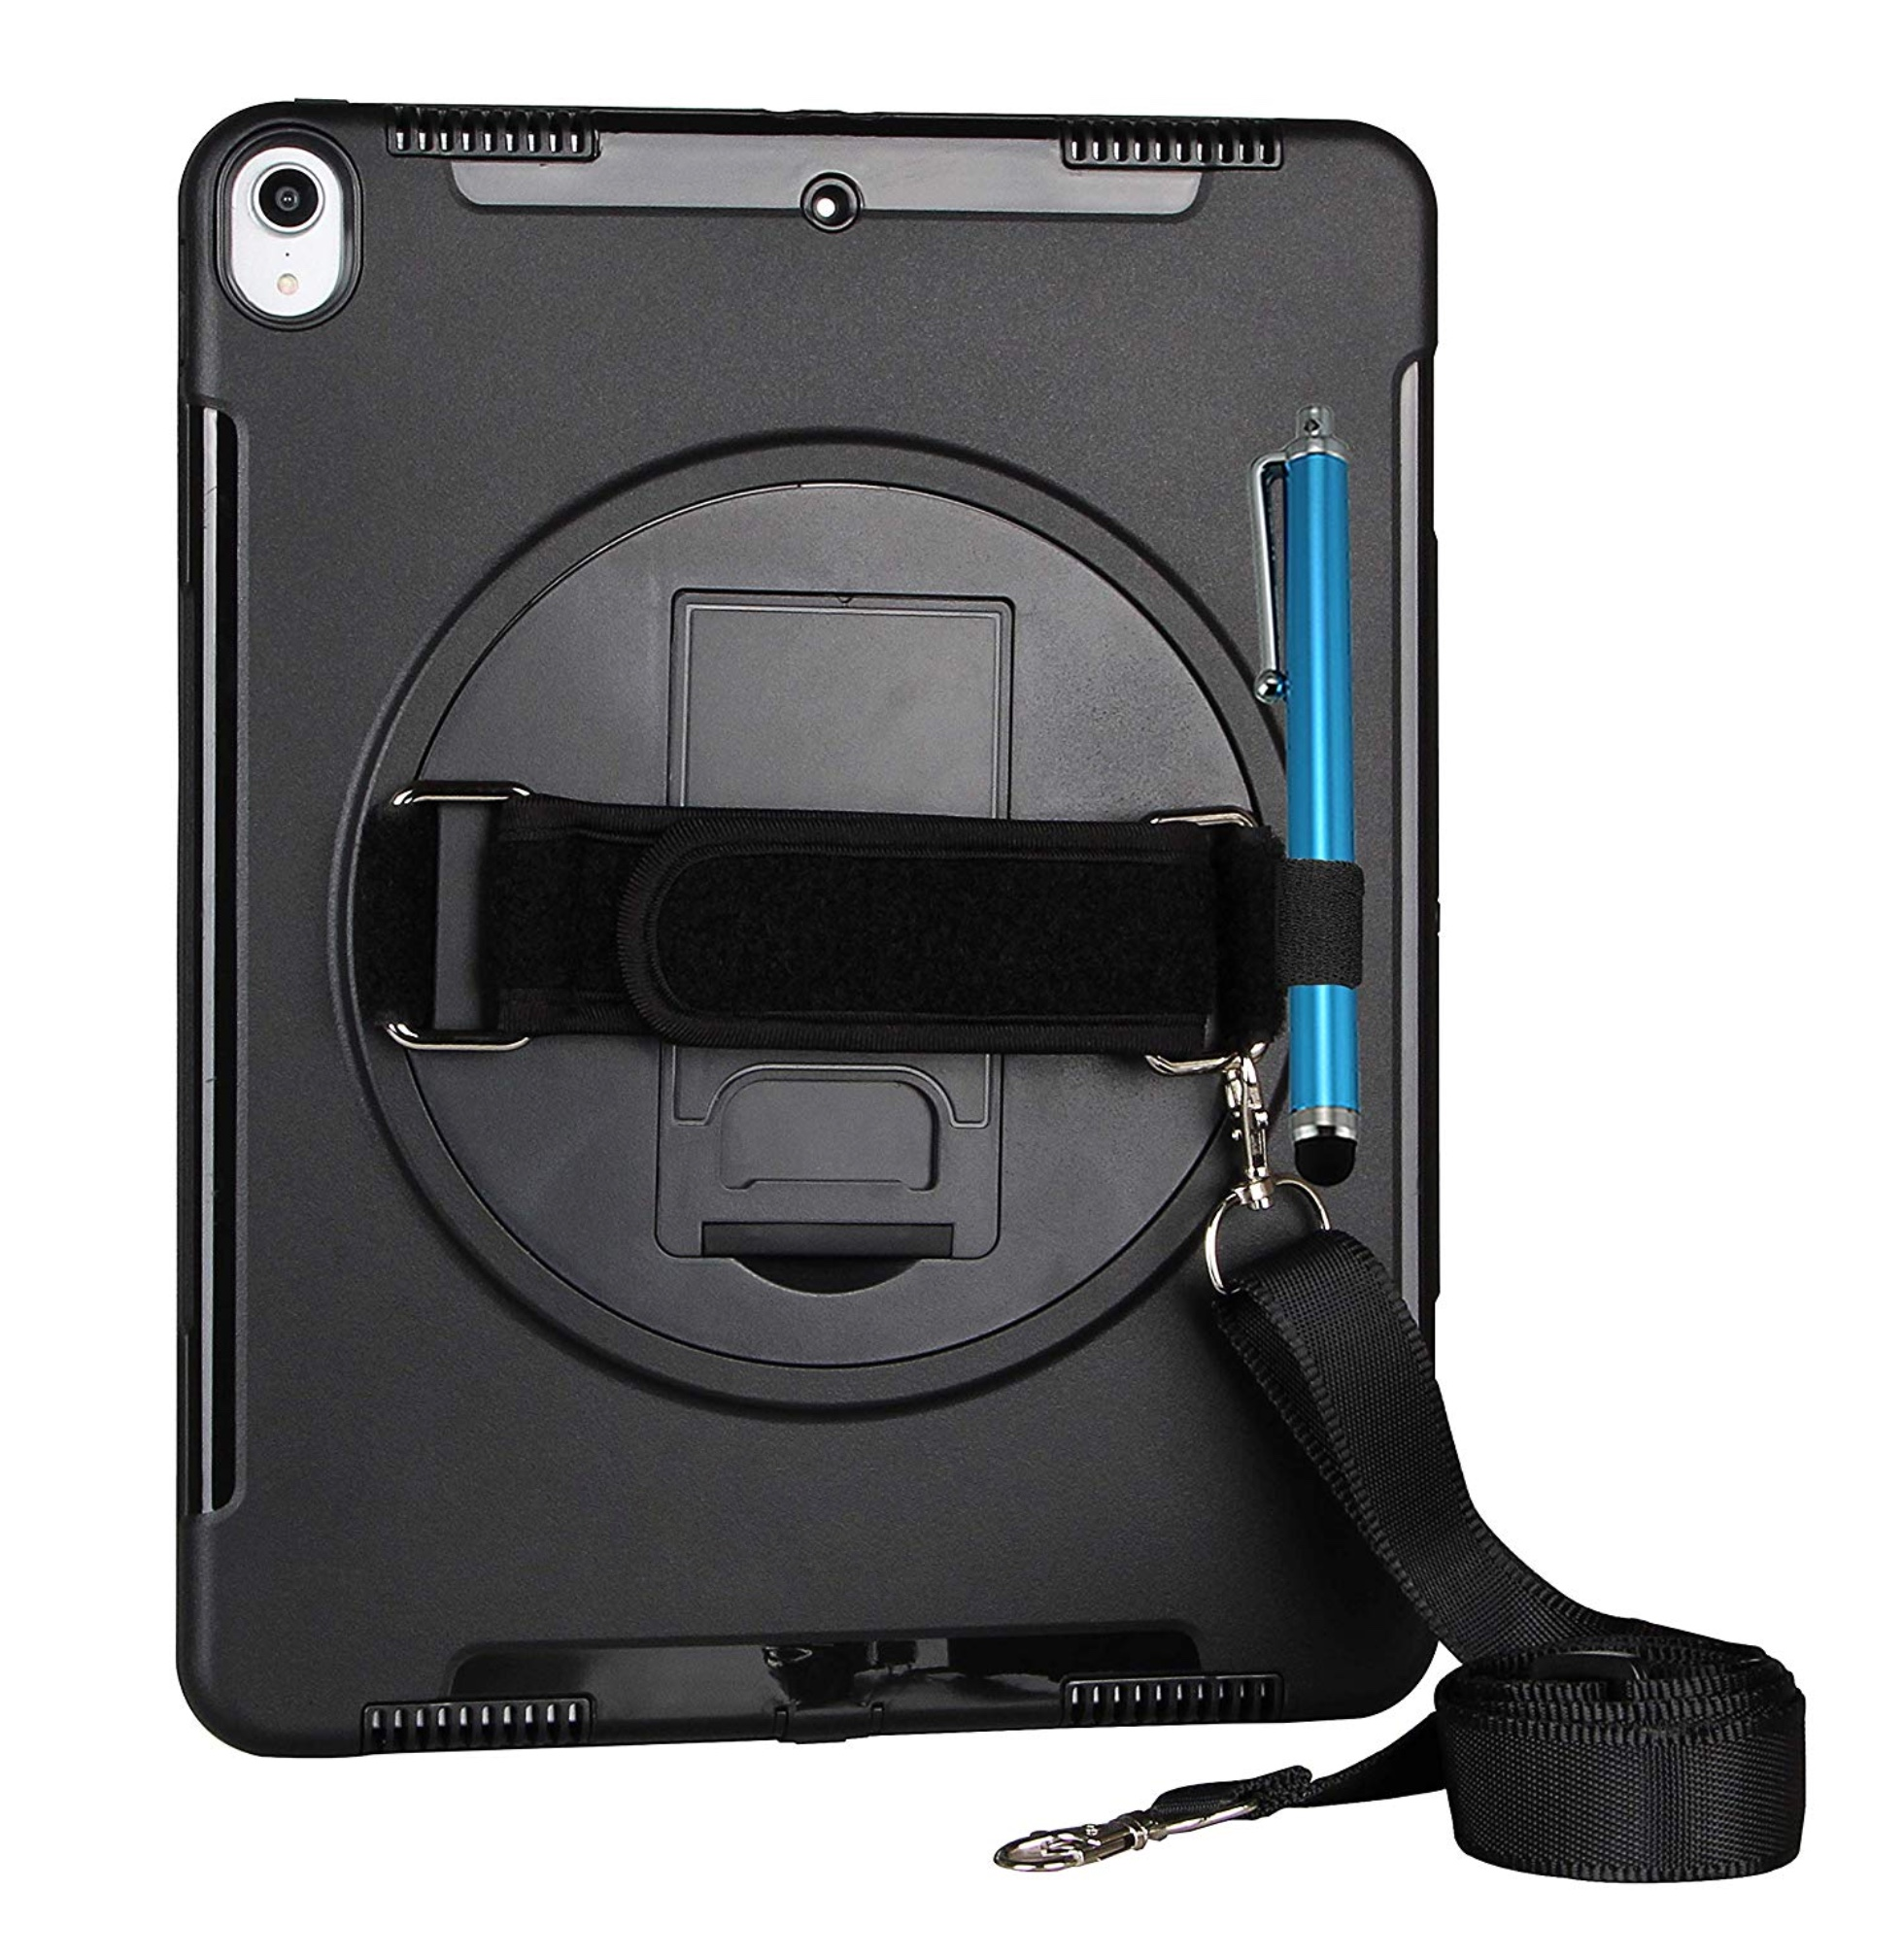 Coque renforcee Sangle main Harnais cou et verre de protection ecran iPad PRO 2018 12.9 3e Gen Monterrey